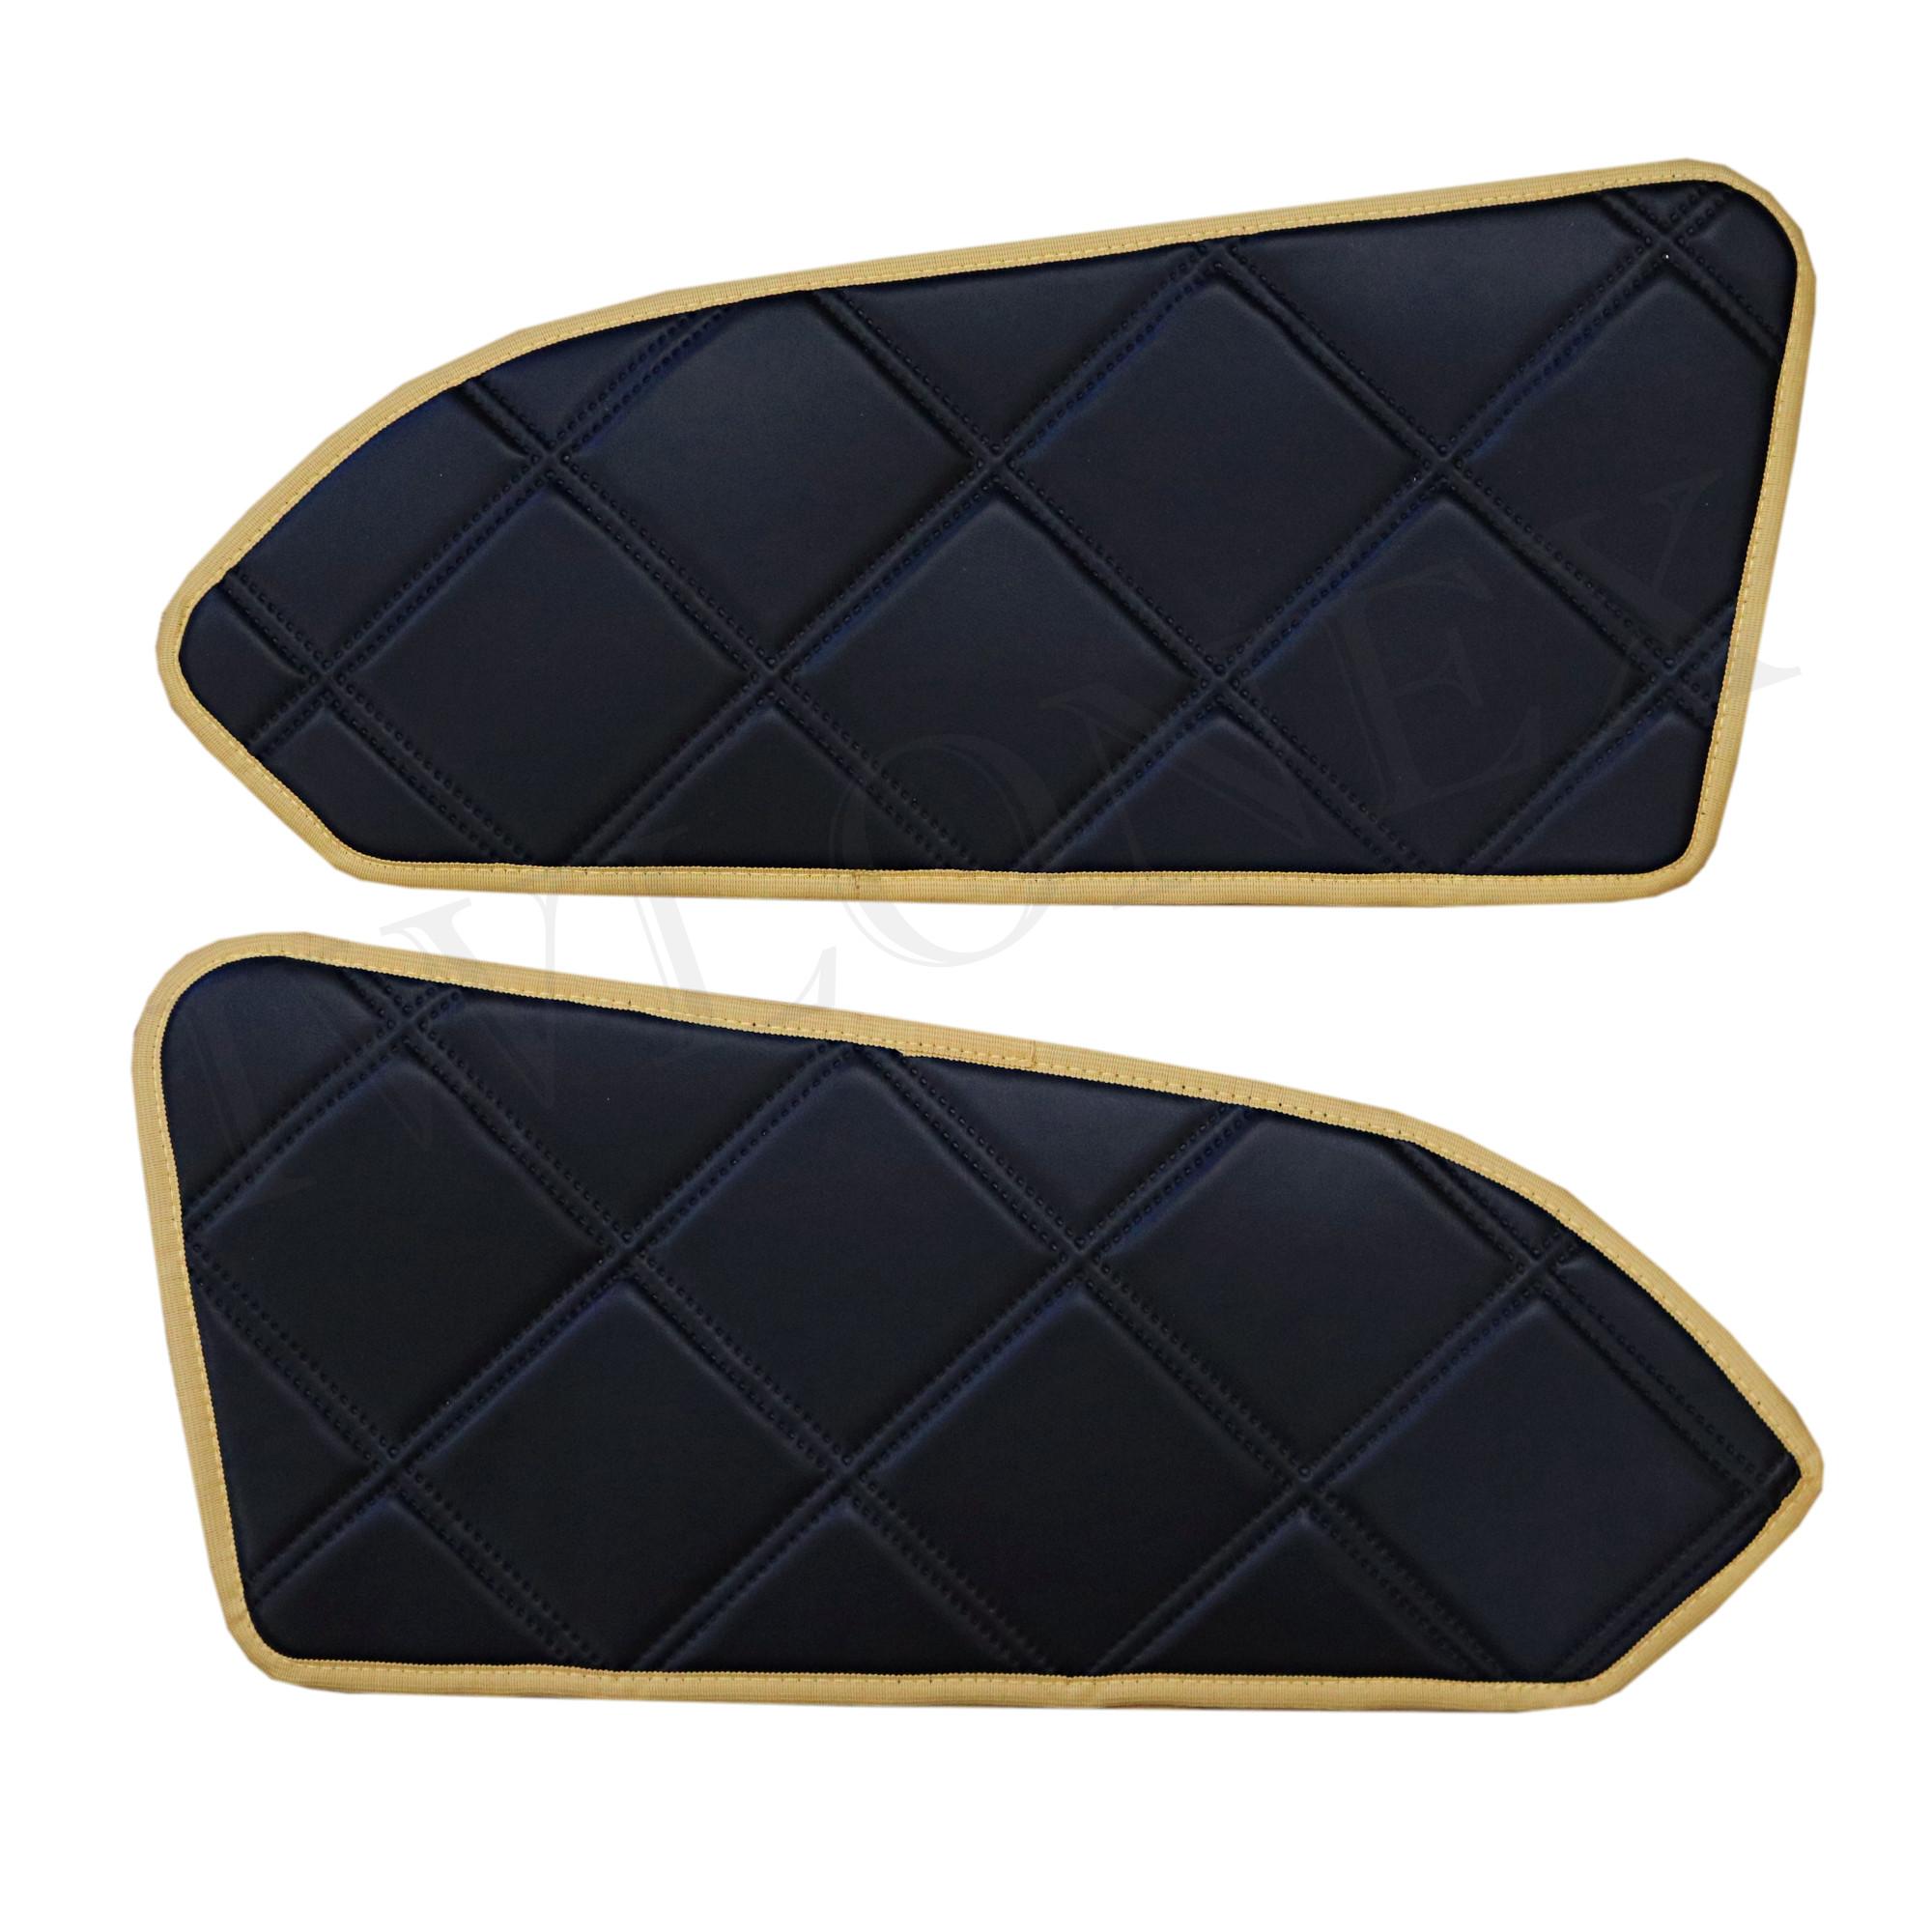 fu matte passend f r mb mp4 mega set deine farben und. Black Bedroom Furniture Sets. Home Design Ideas